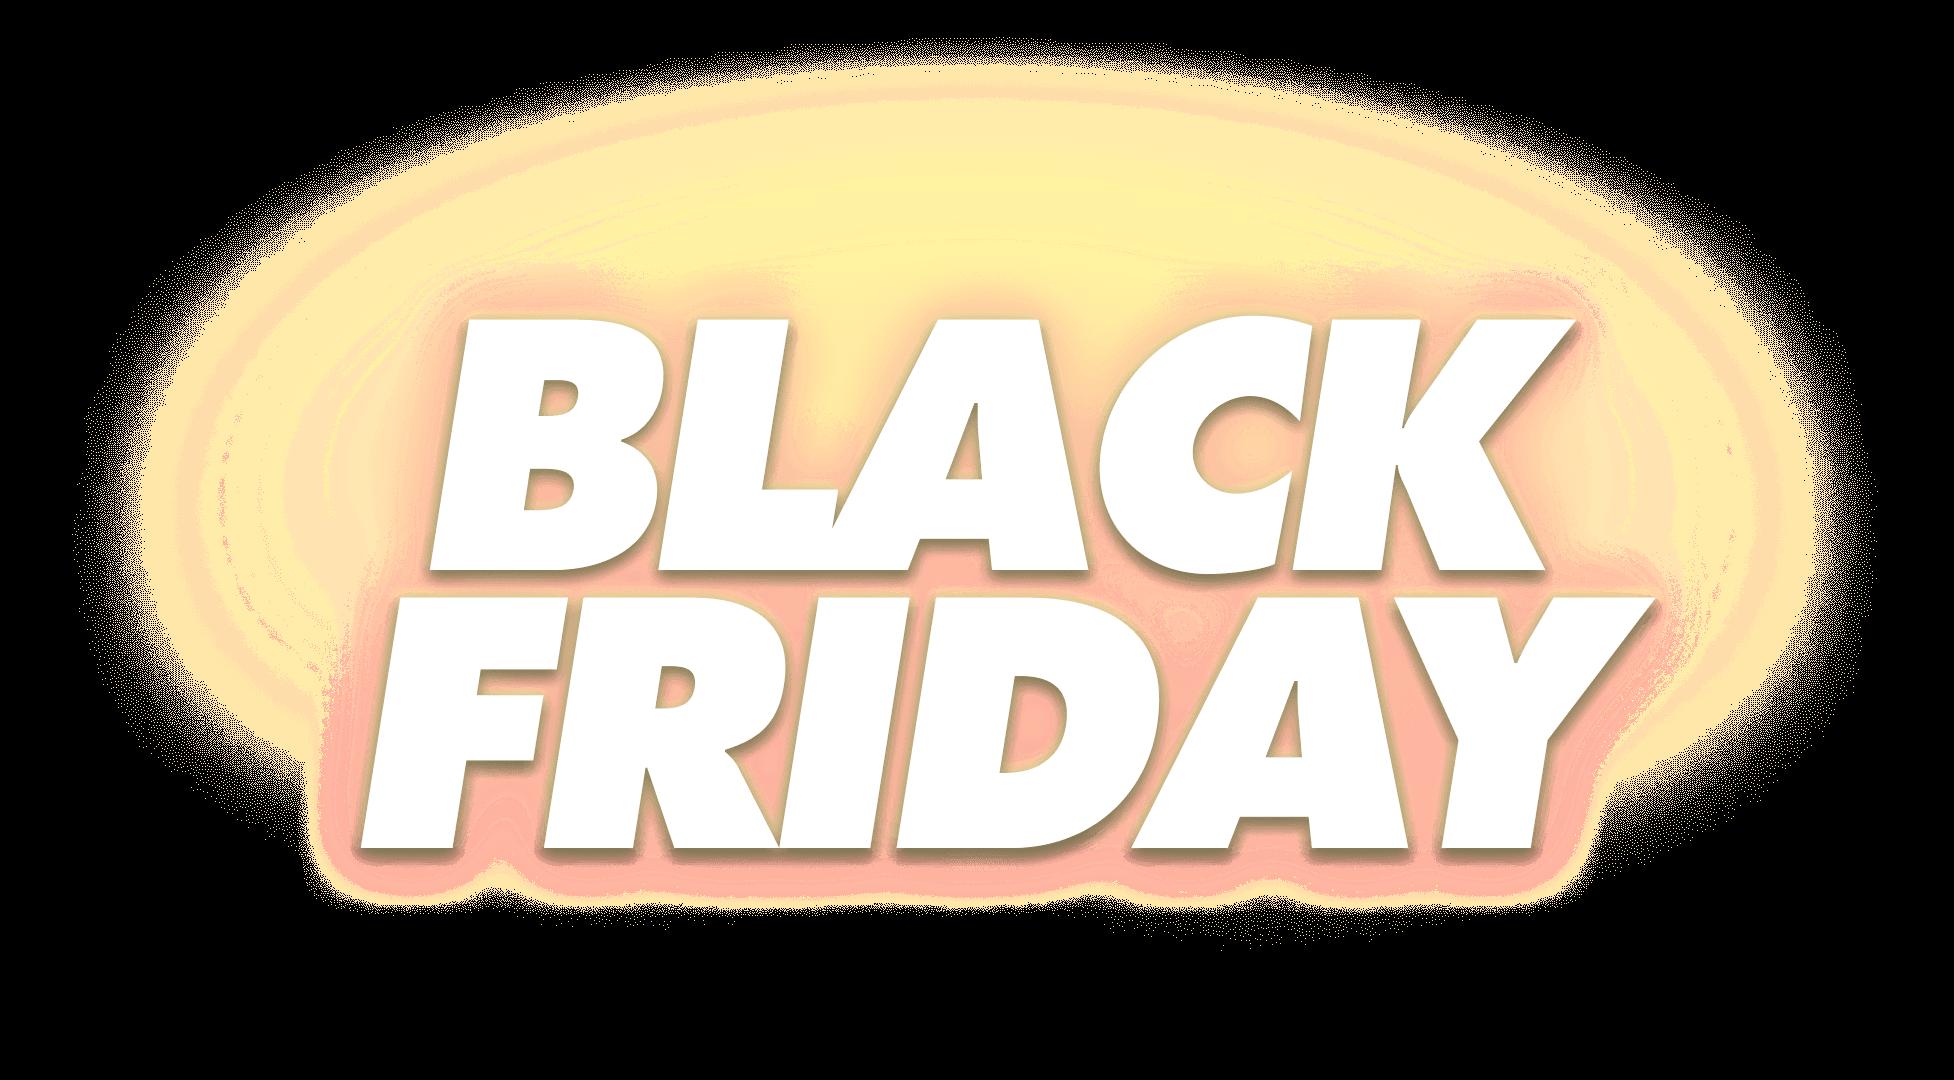 Black Friday text